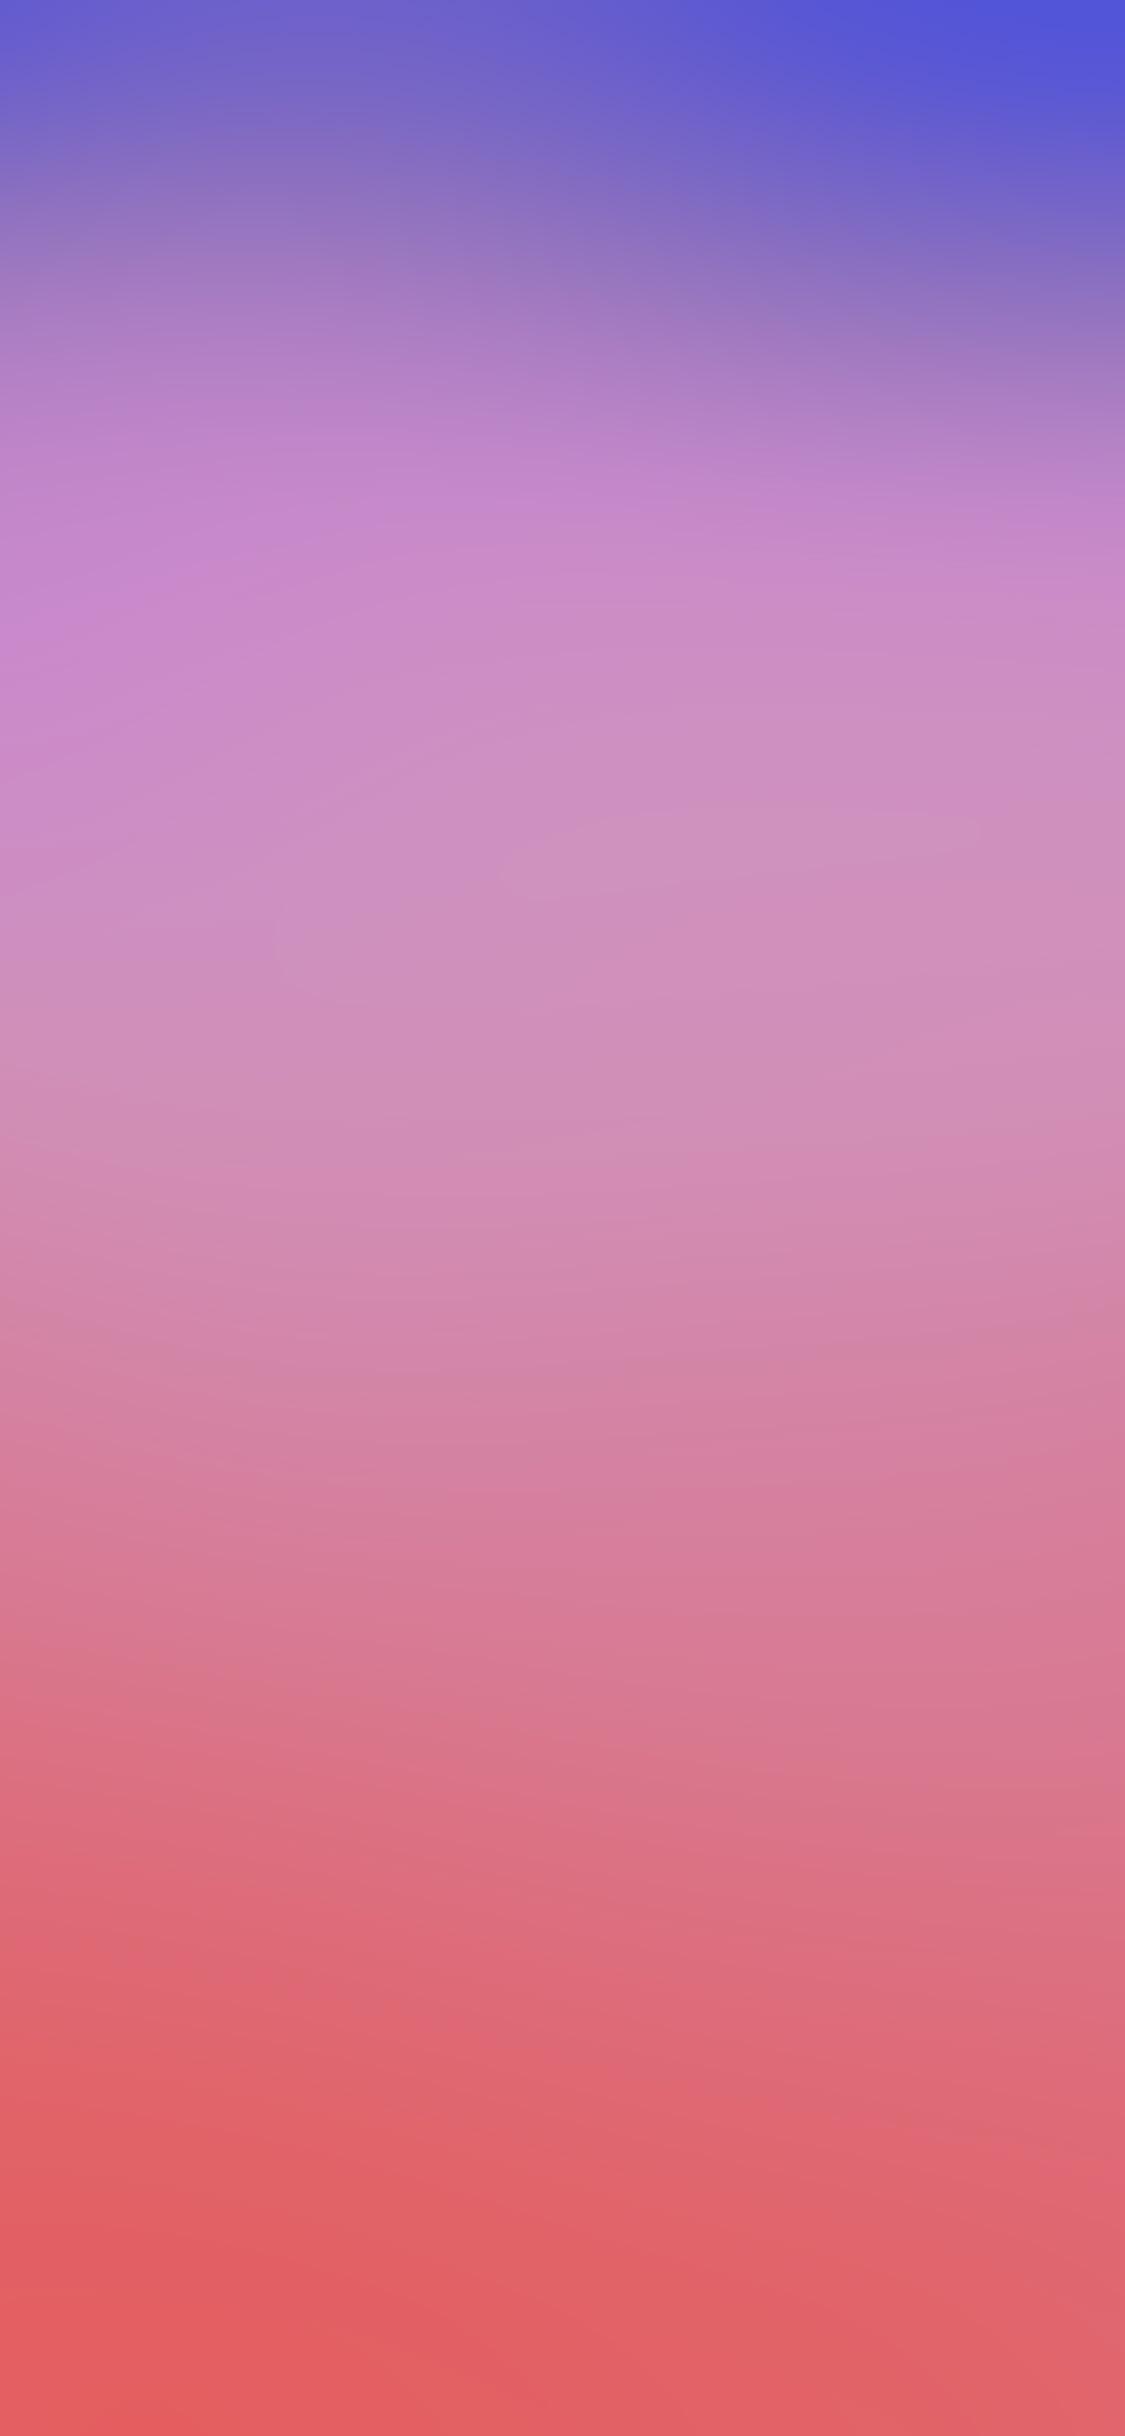 iPhoneXpapers.com-Apple-iPhone-wallpaper-sl77-red-pink-peach-blur-gradation